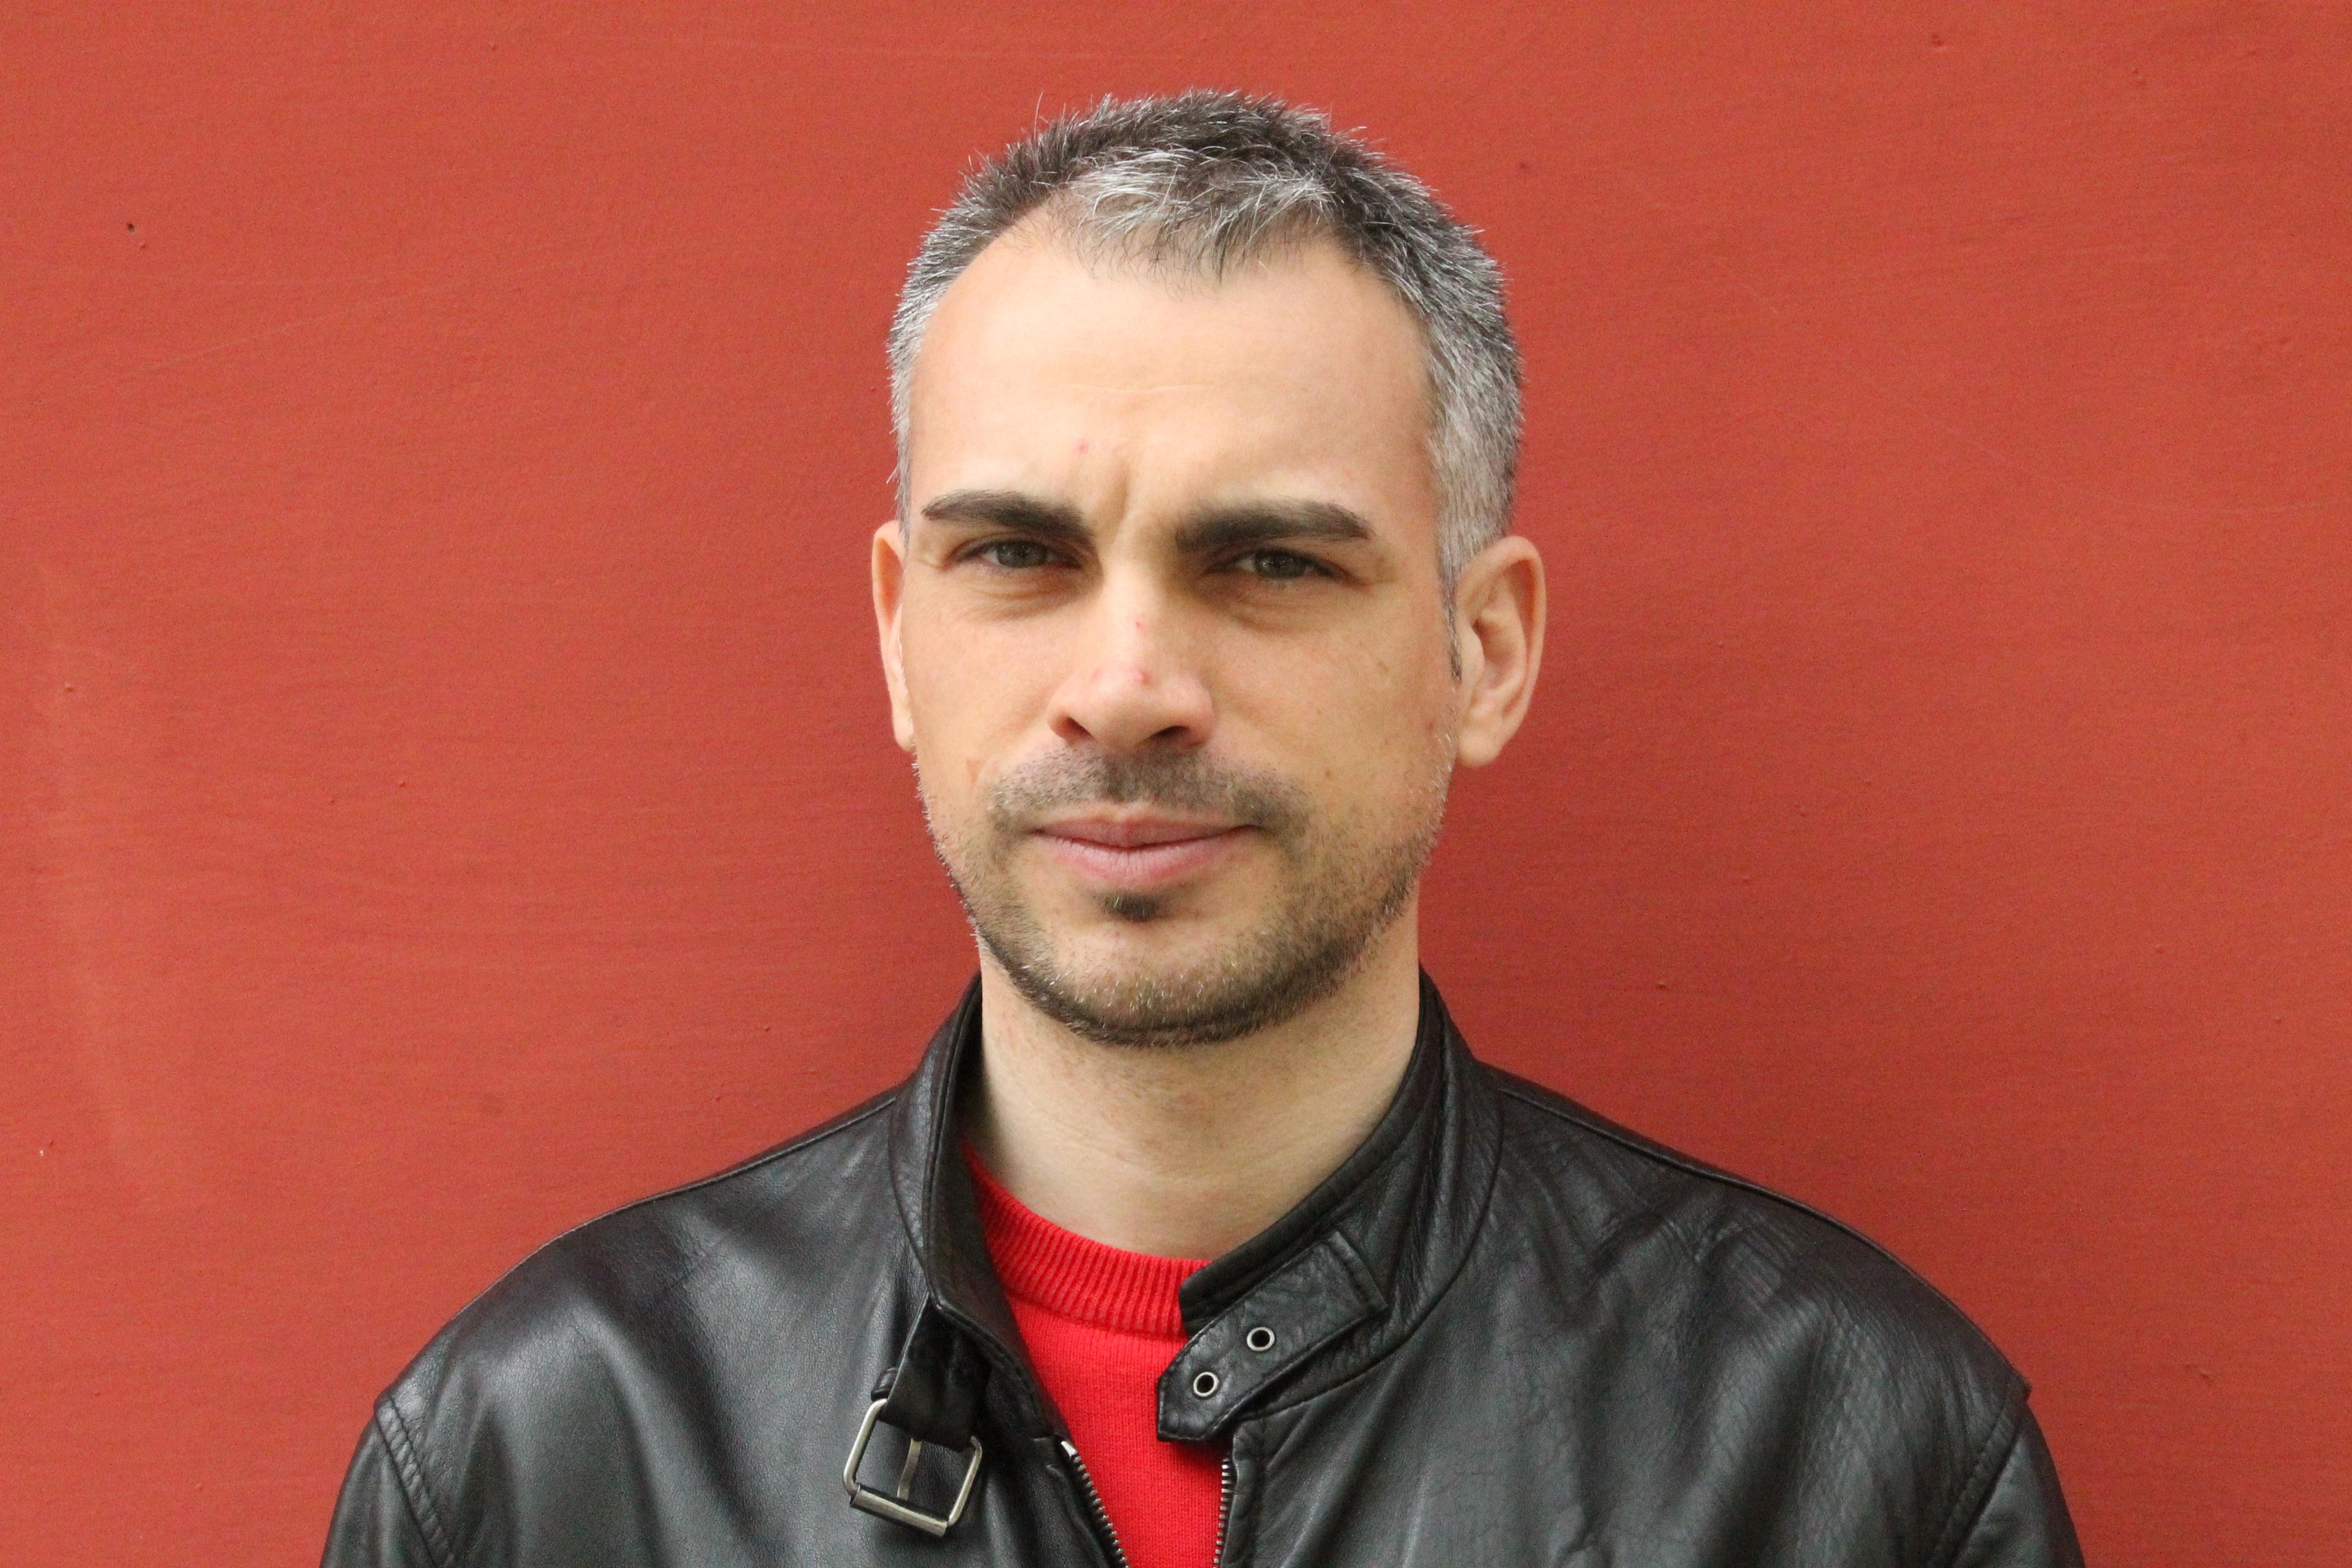 Giuseppe Zucco